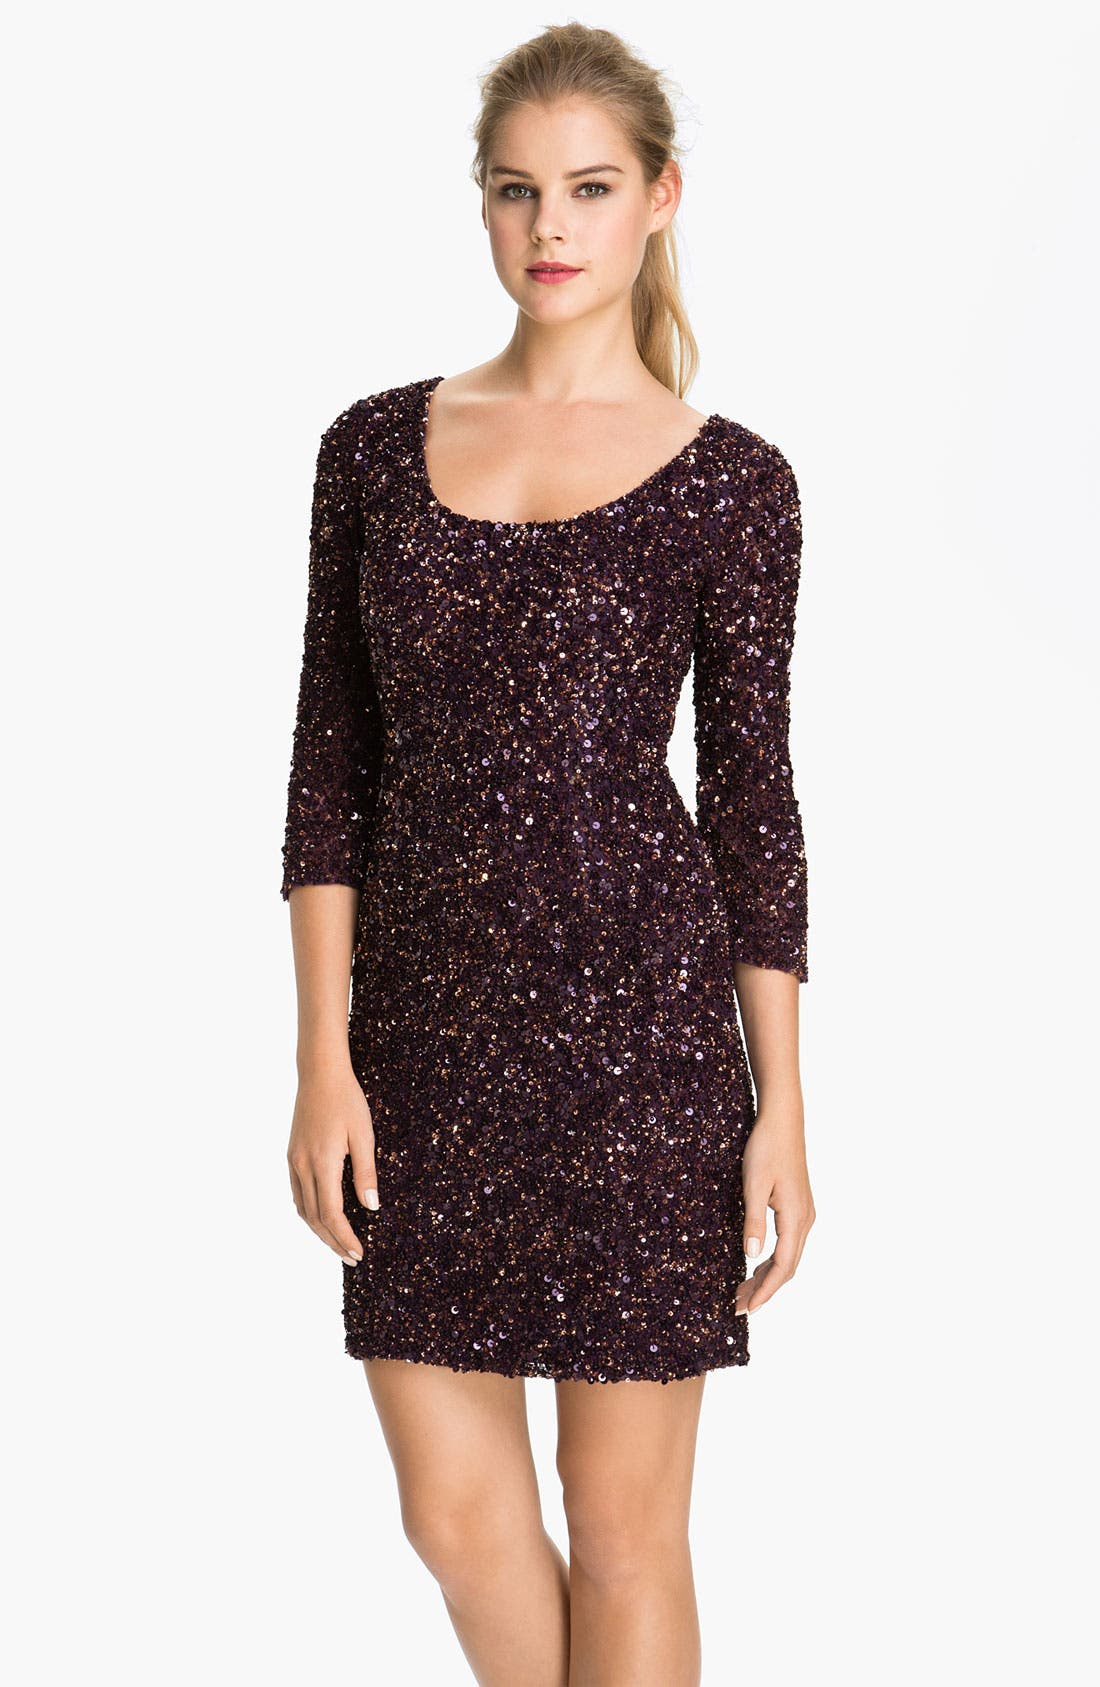 Alternate Image 1 Selected - Pisarro Nights Scoop Neck Sequin Sheath Dress